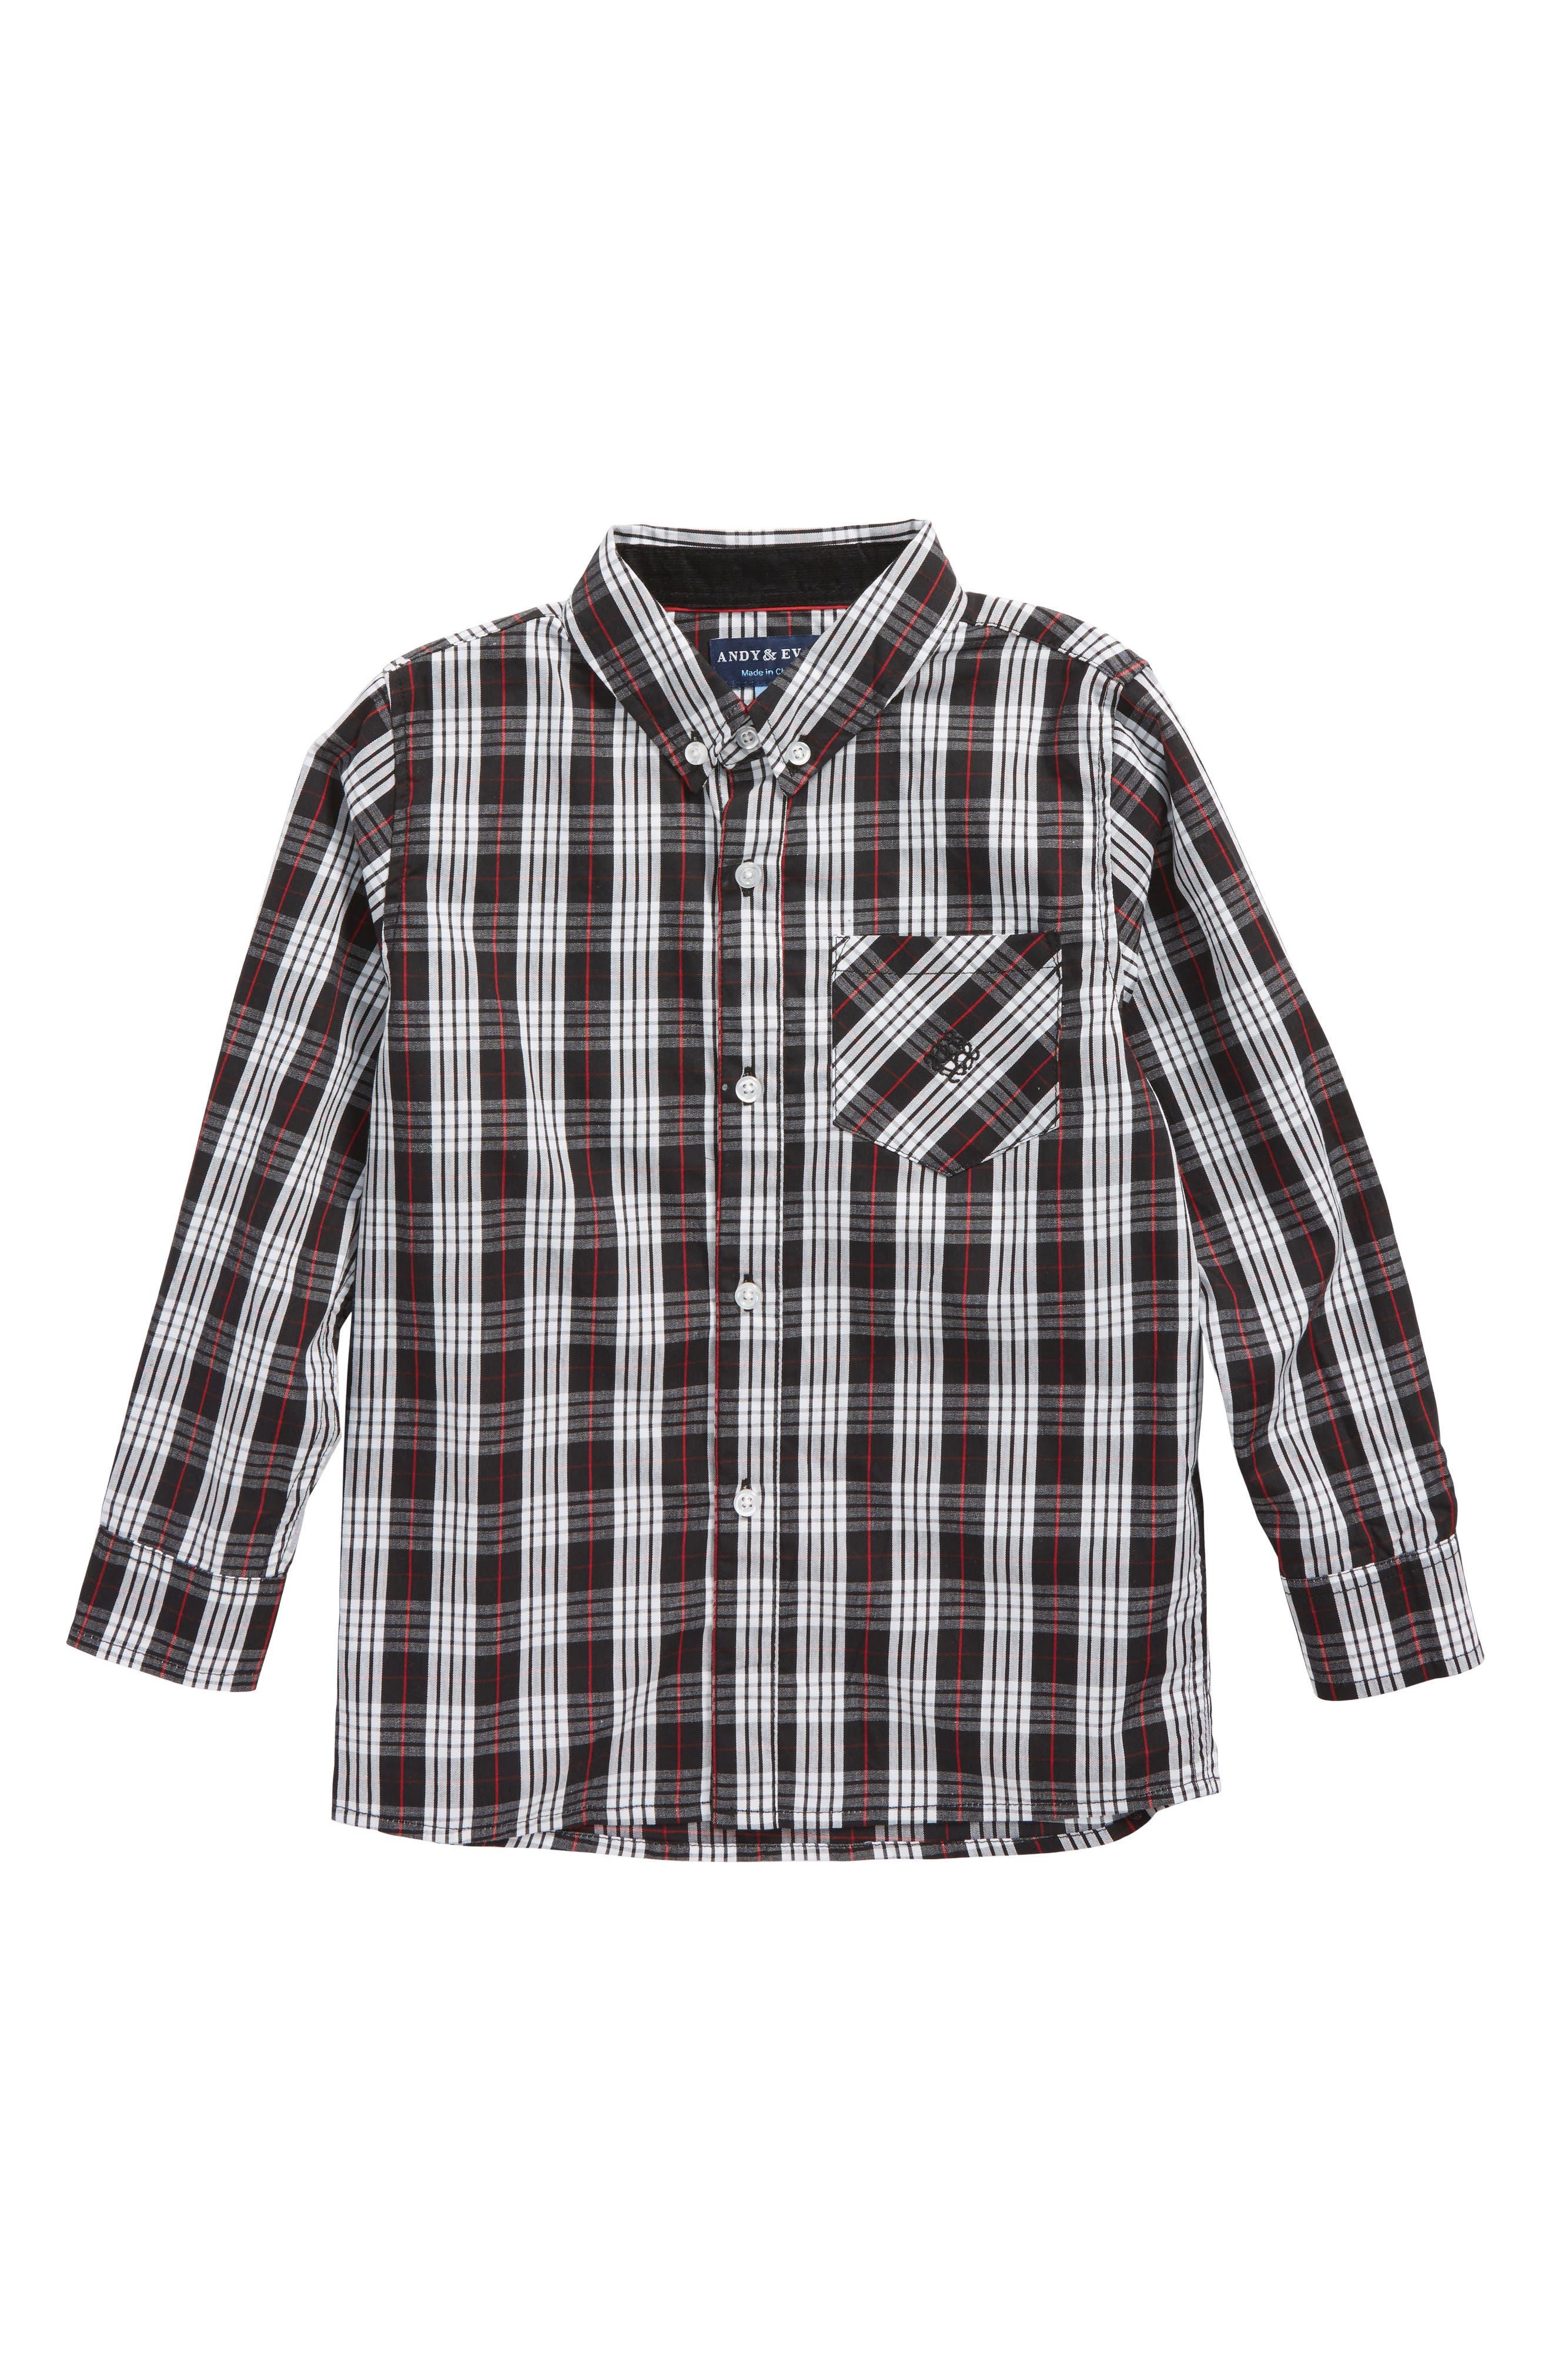 Andy & Evan Plaid Woven Shirt (Toddler Boys & Little Boys)